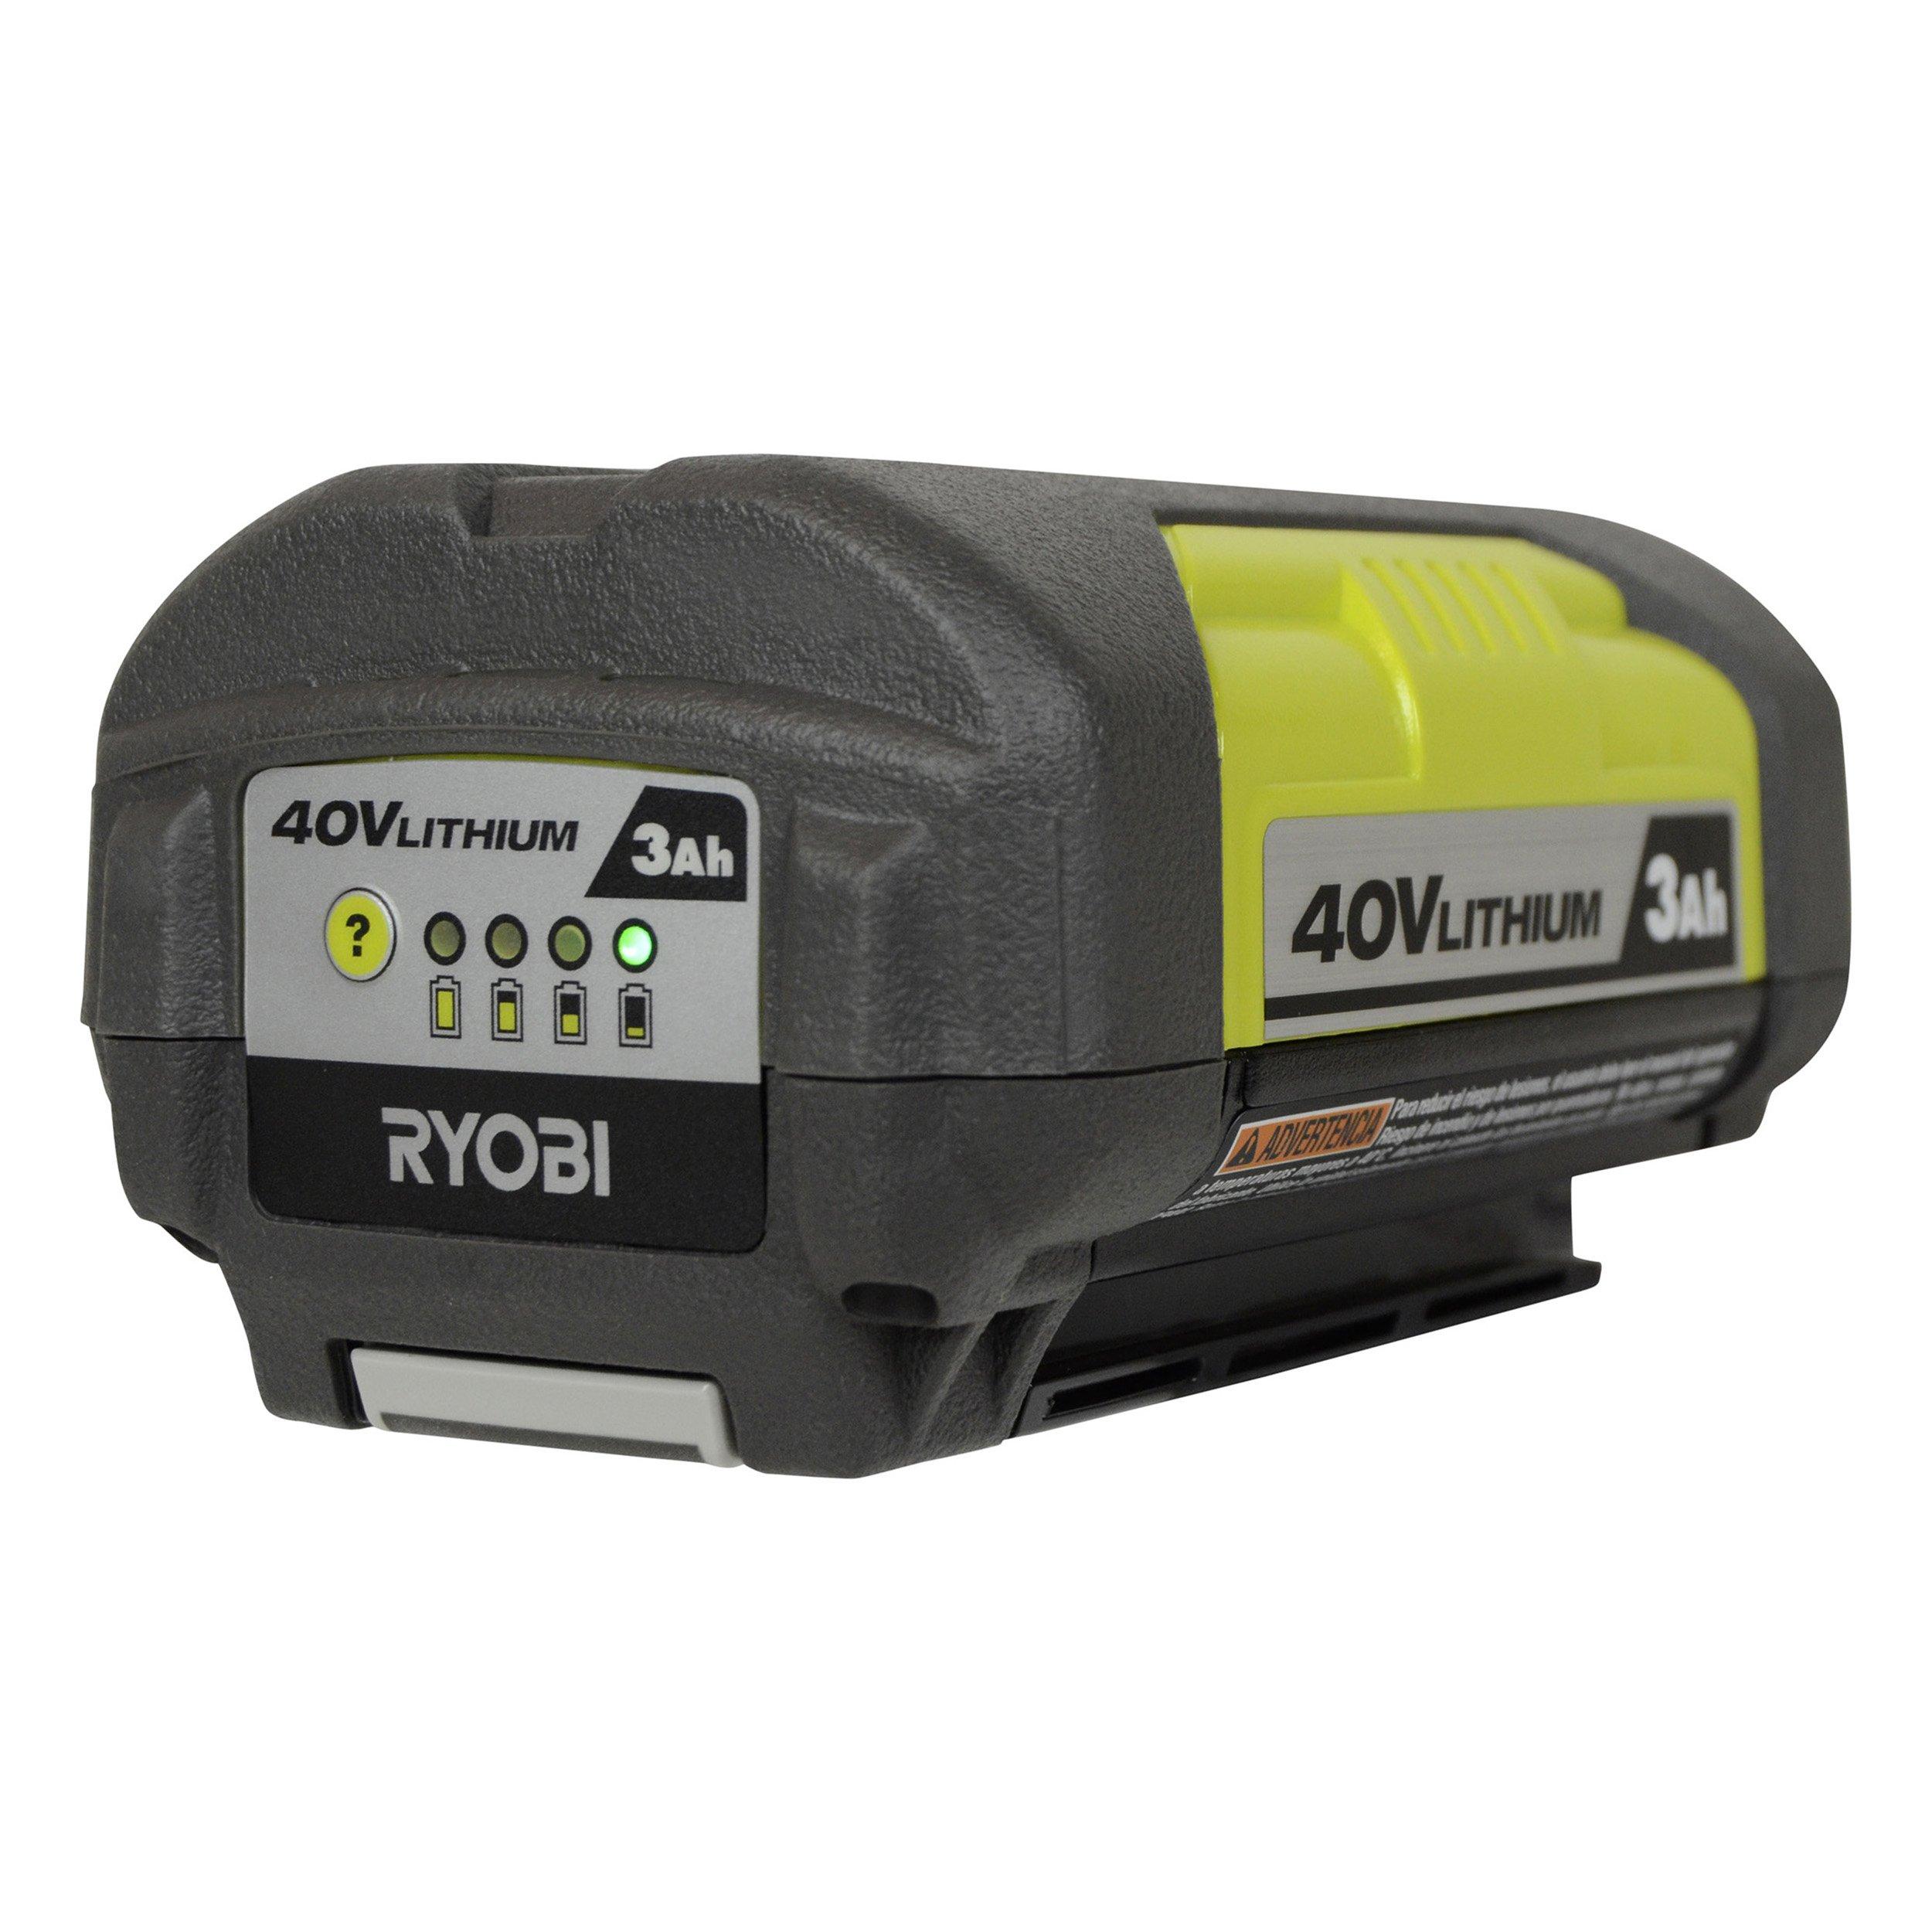 Ryobi OP4030 40V 3.0Ah Lithium ion Battery w/ Fuel Gauge by Ryobi (Image #2)